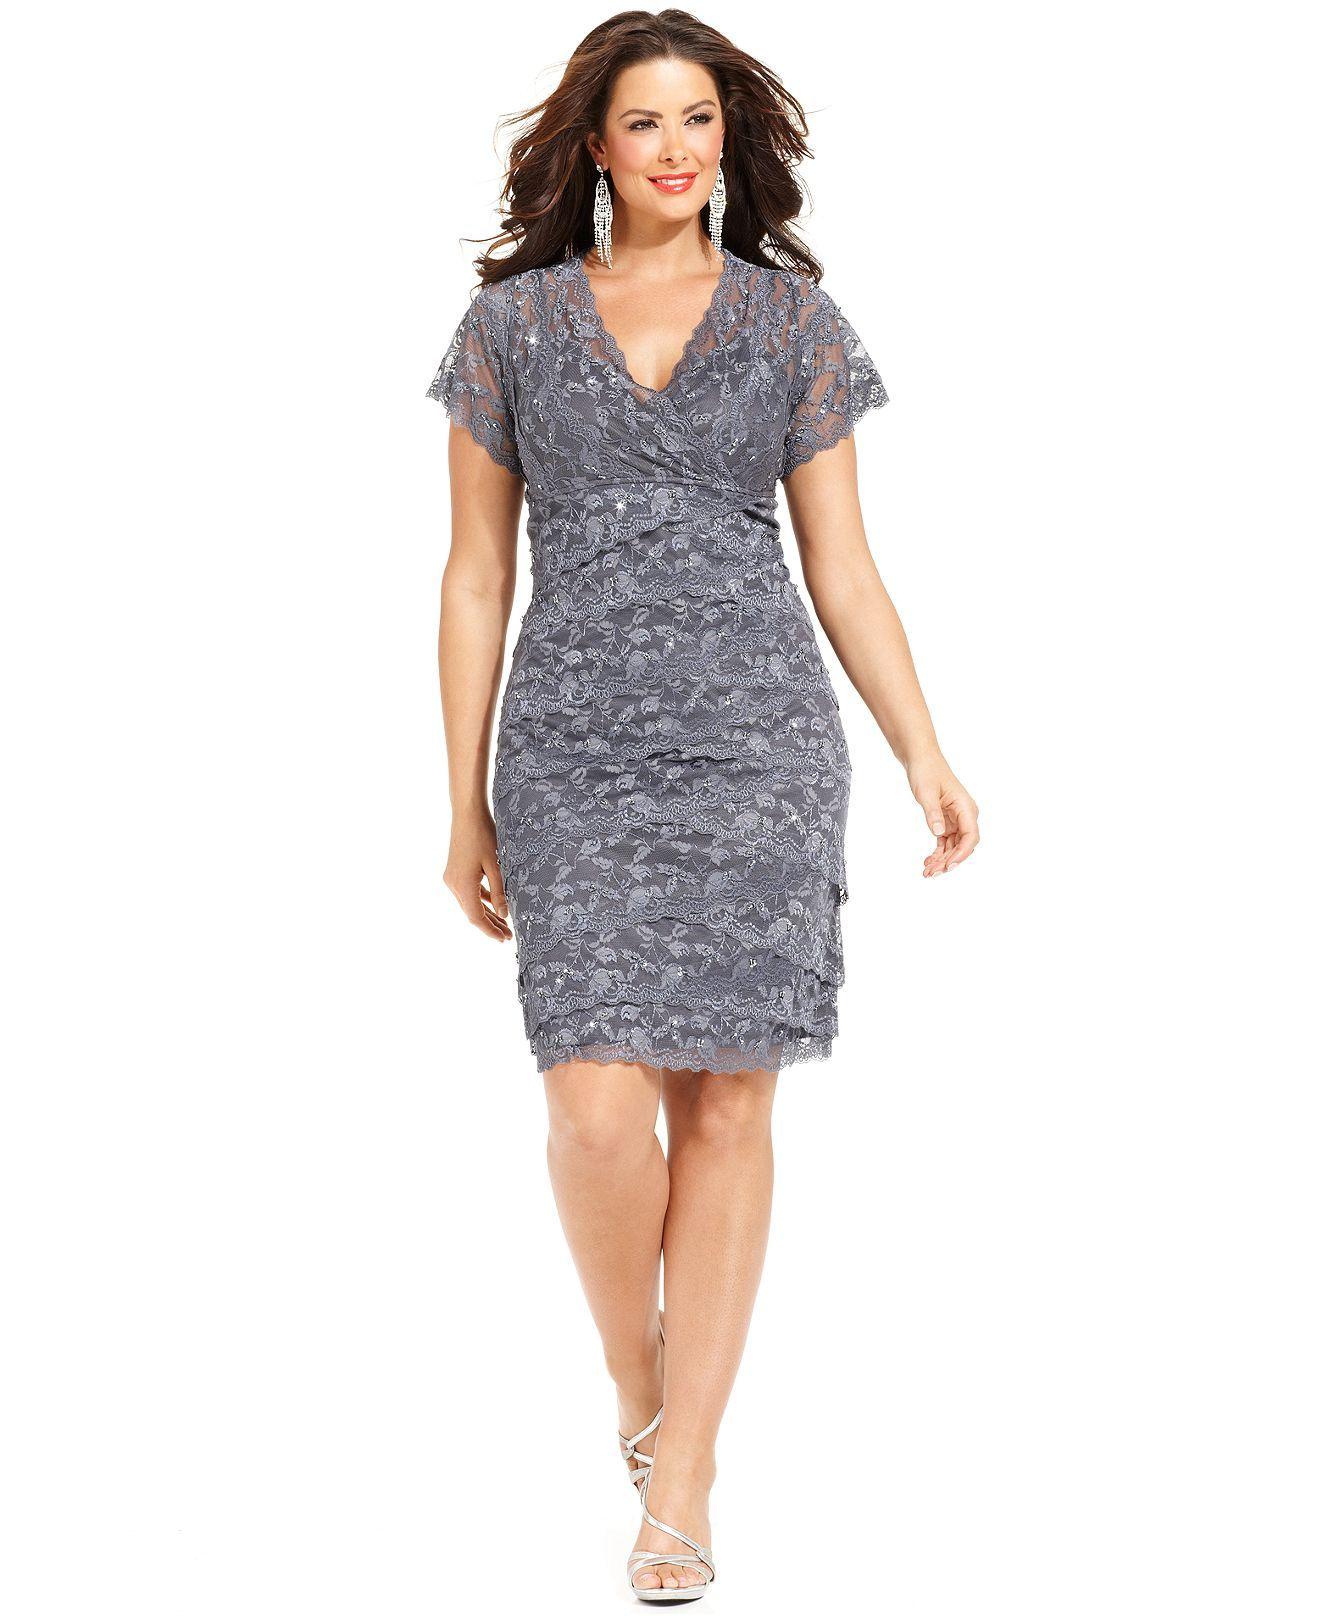 4d21975215 Marina Plus Size Dress, Cap Sleeve Lace Cocktail Dress - Plus Size Dresses  - Plus Sizes - Macys